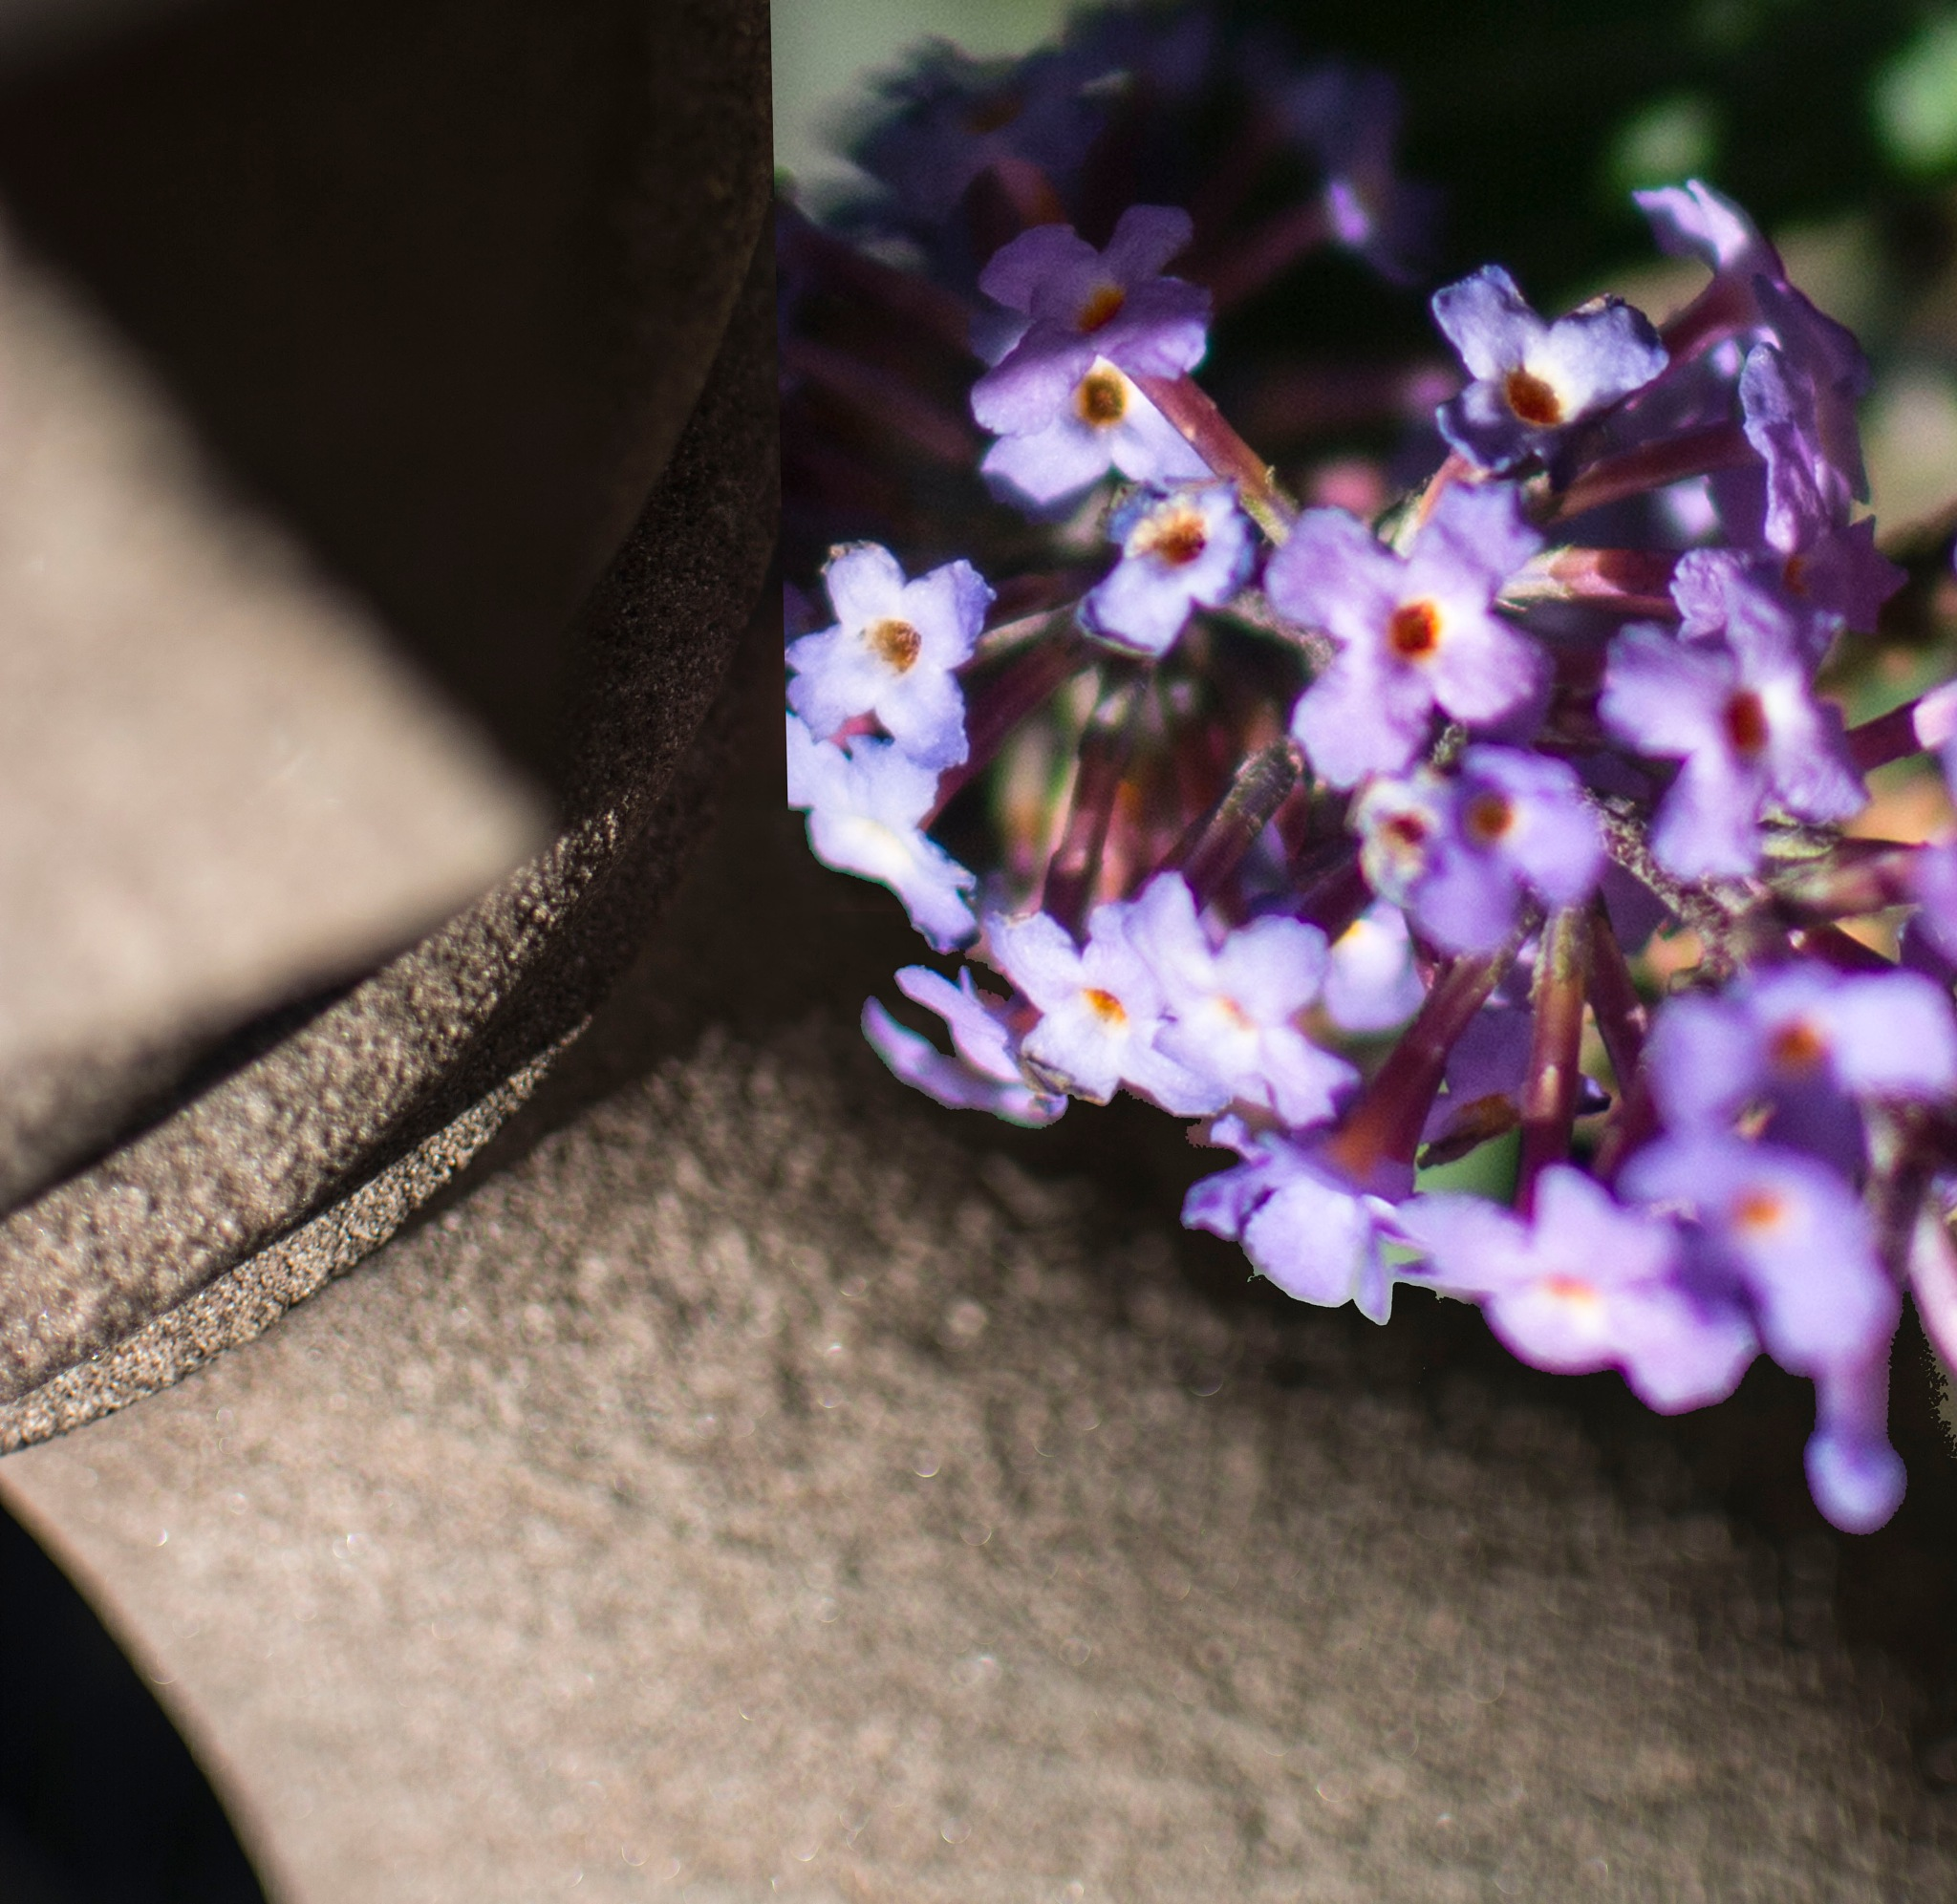 Tiny flowers poking through by simie